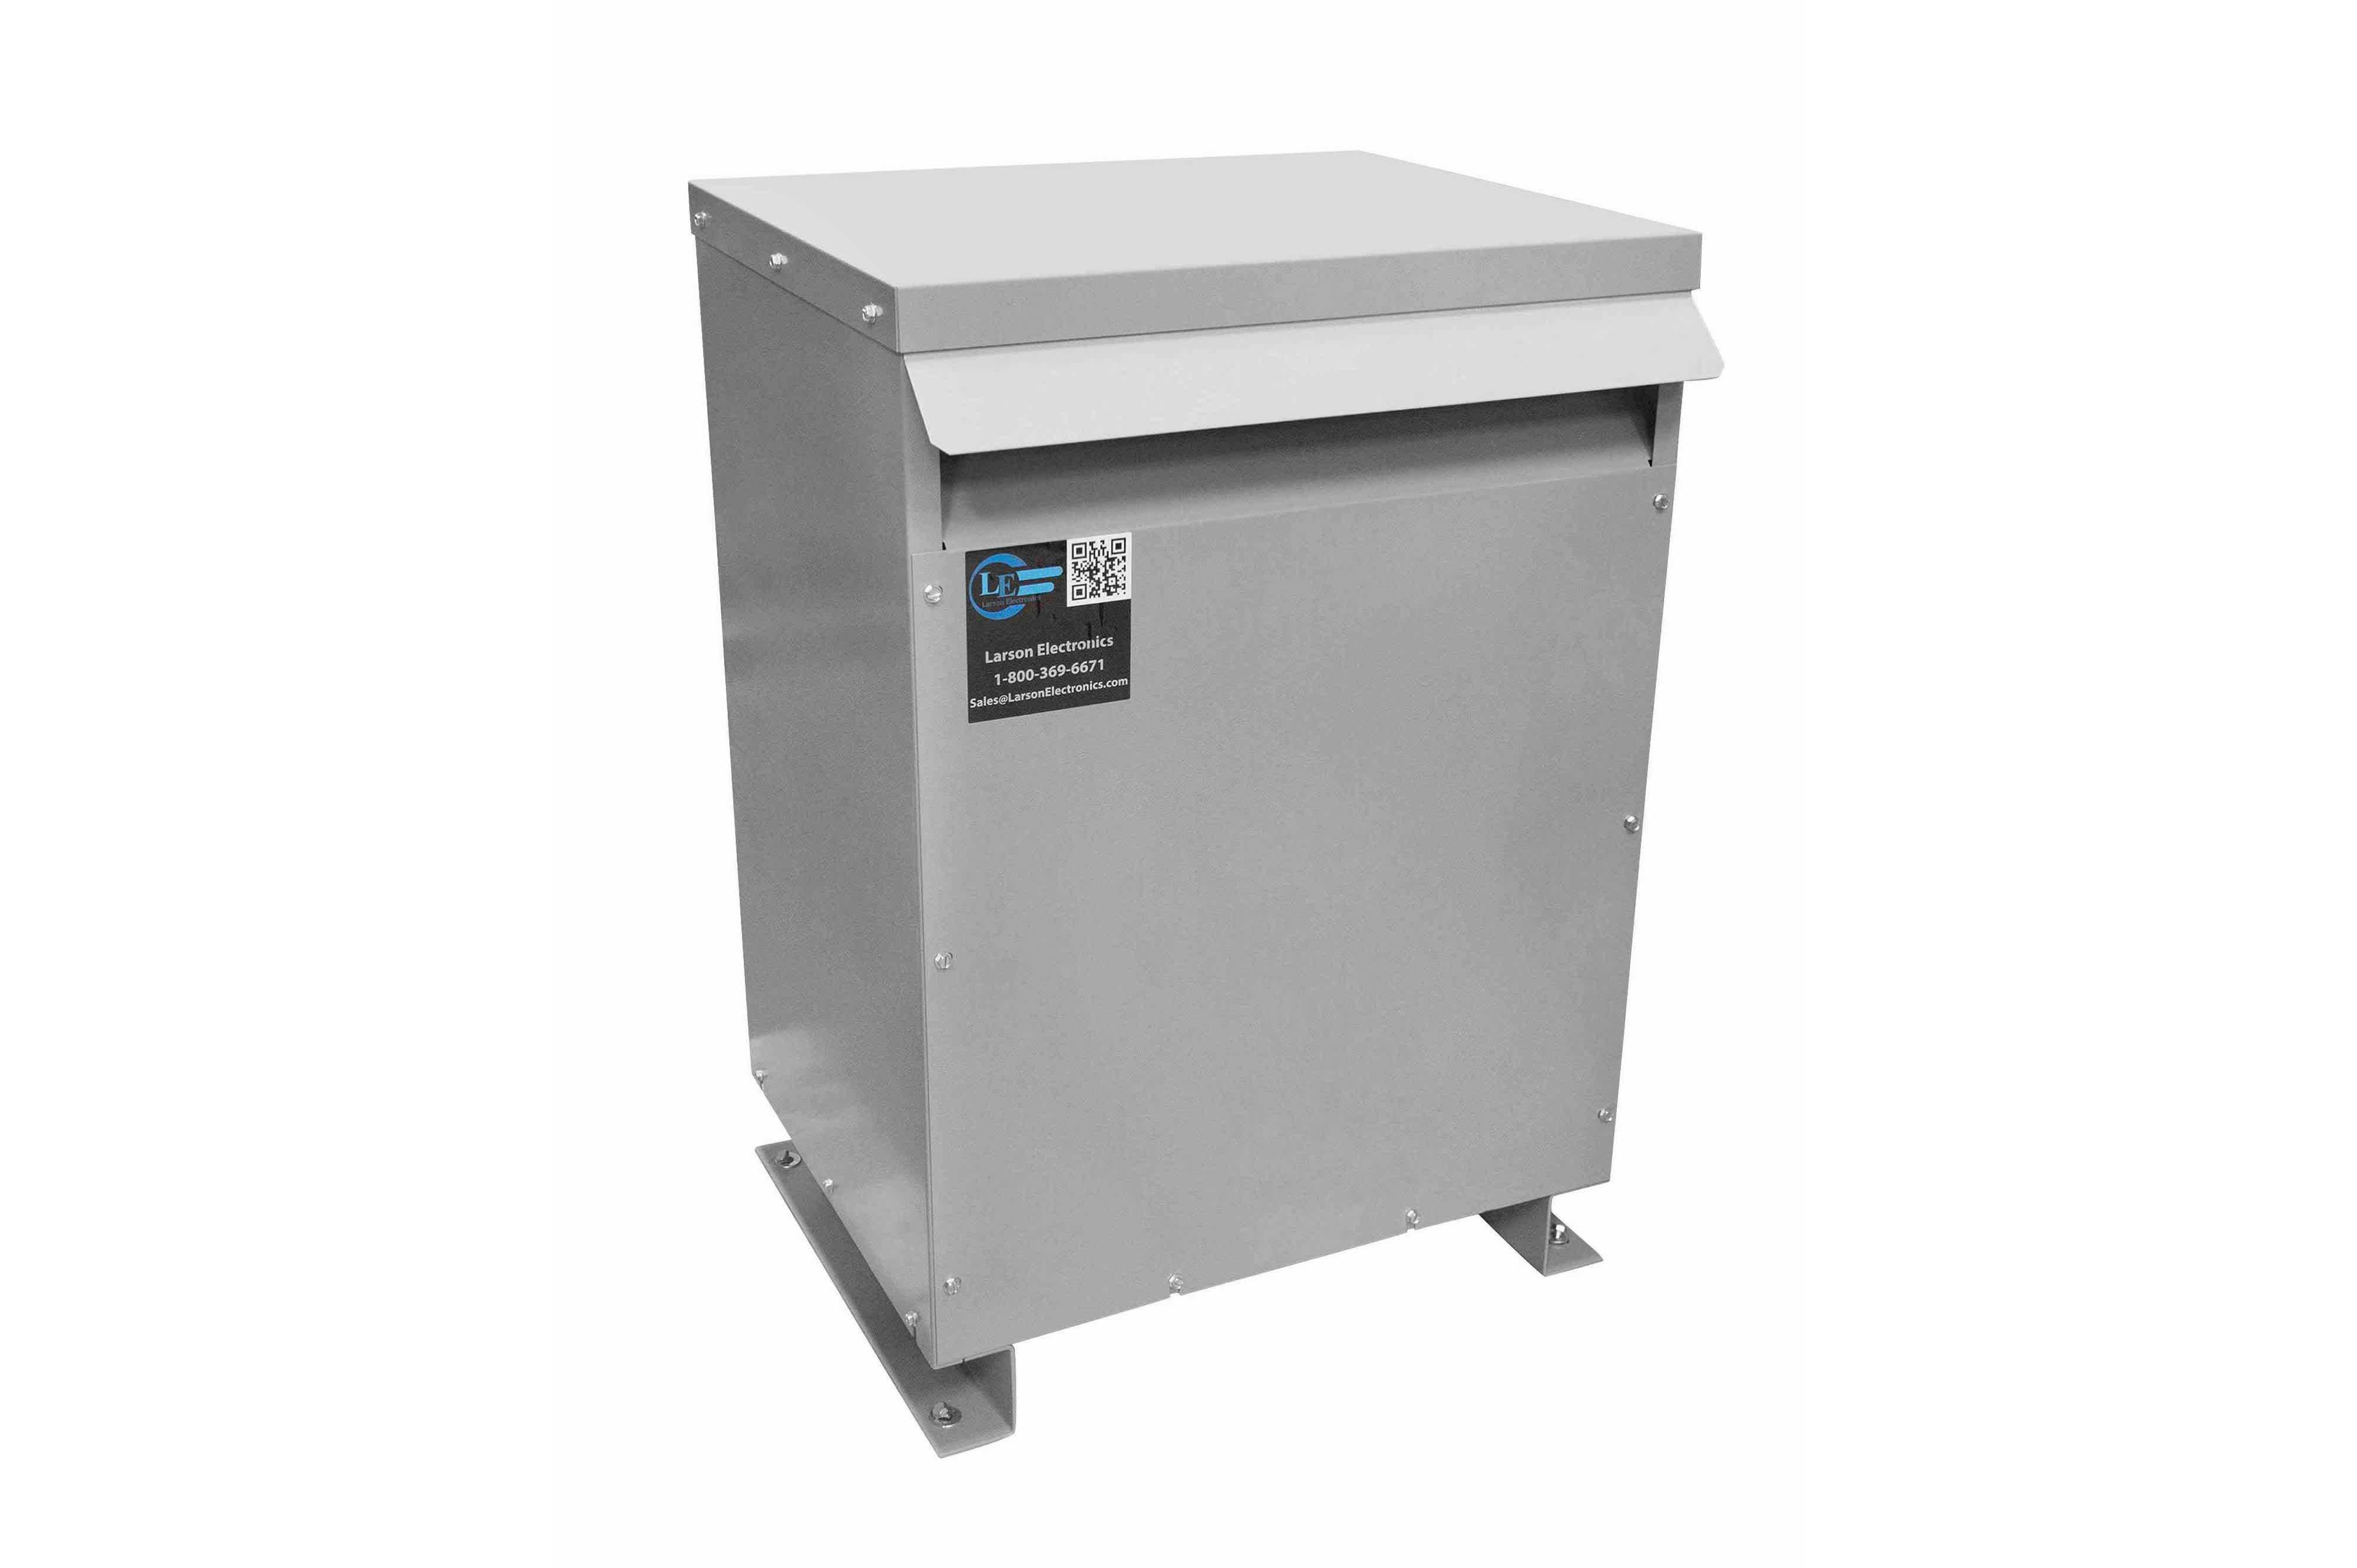 15 kVA 3PH Isolation Transformer, 575V Wye Primary, 208Y/120 Wye-N Secondary, N3R, Ventilated, 60 Hz